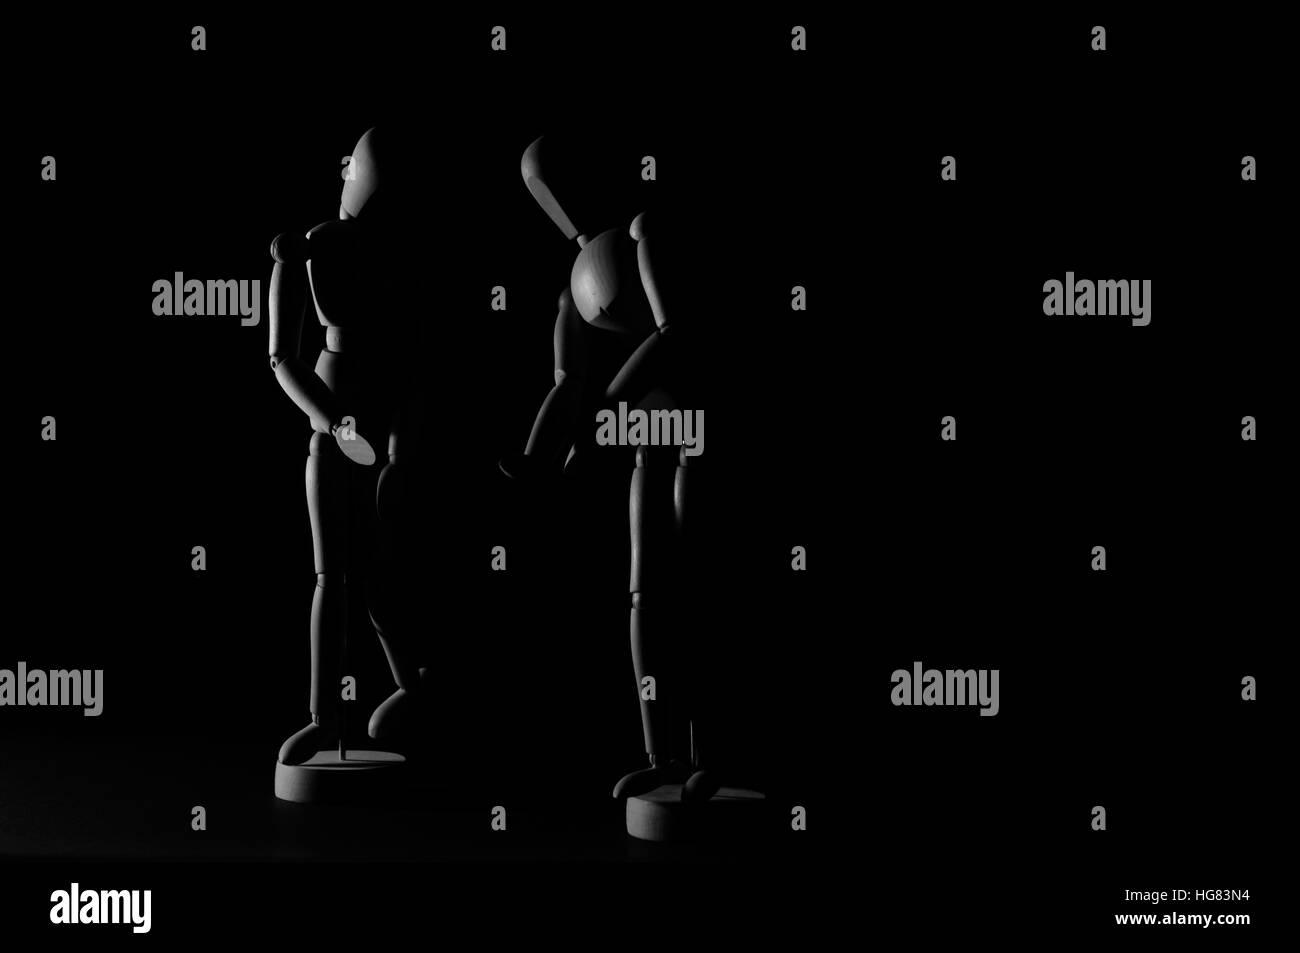 Wooden models on black background - Stock Image